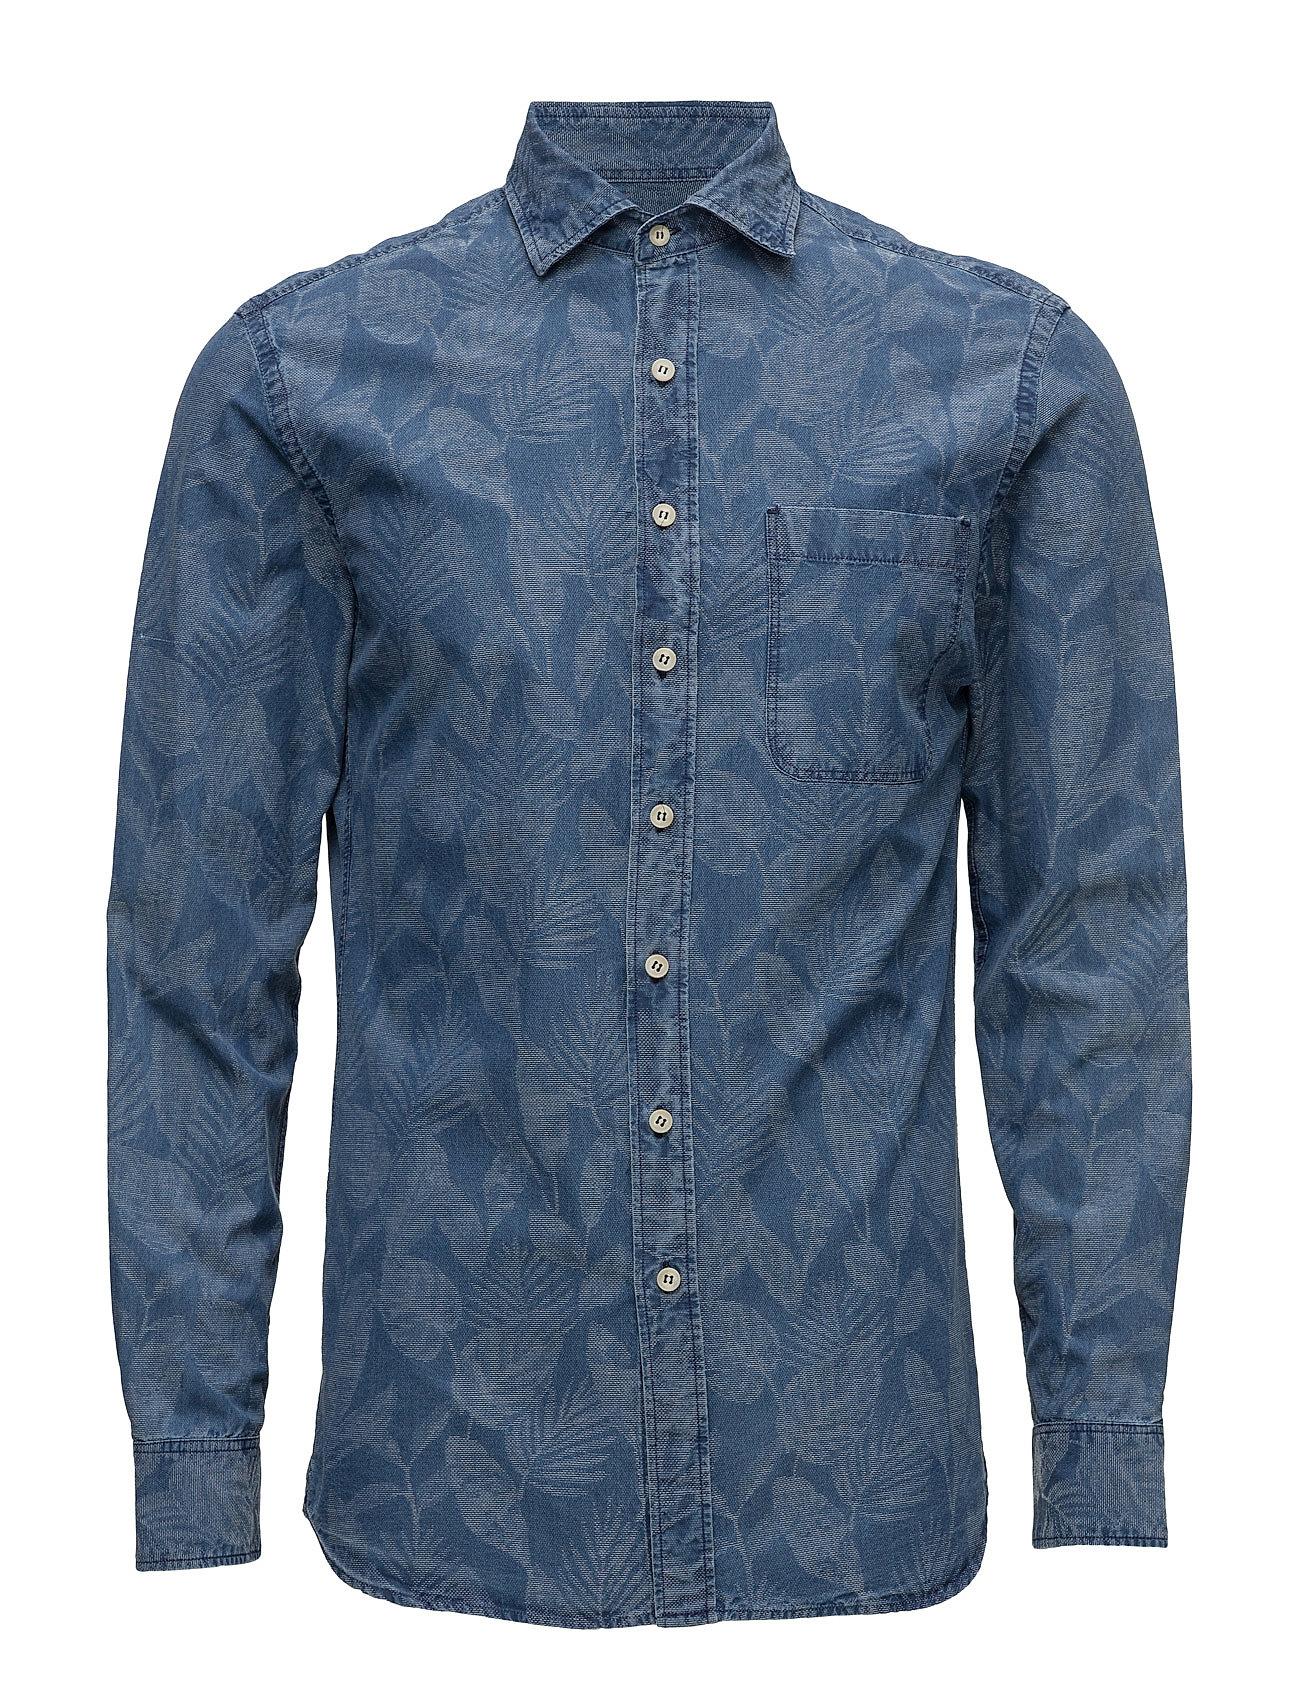 Slim-Fit Floral-Print Chambray Shirt Mango Man Casual sko til Herrer i Medium Blå